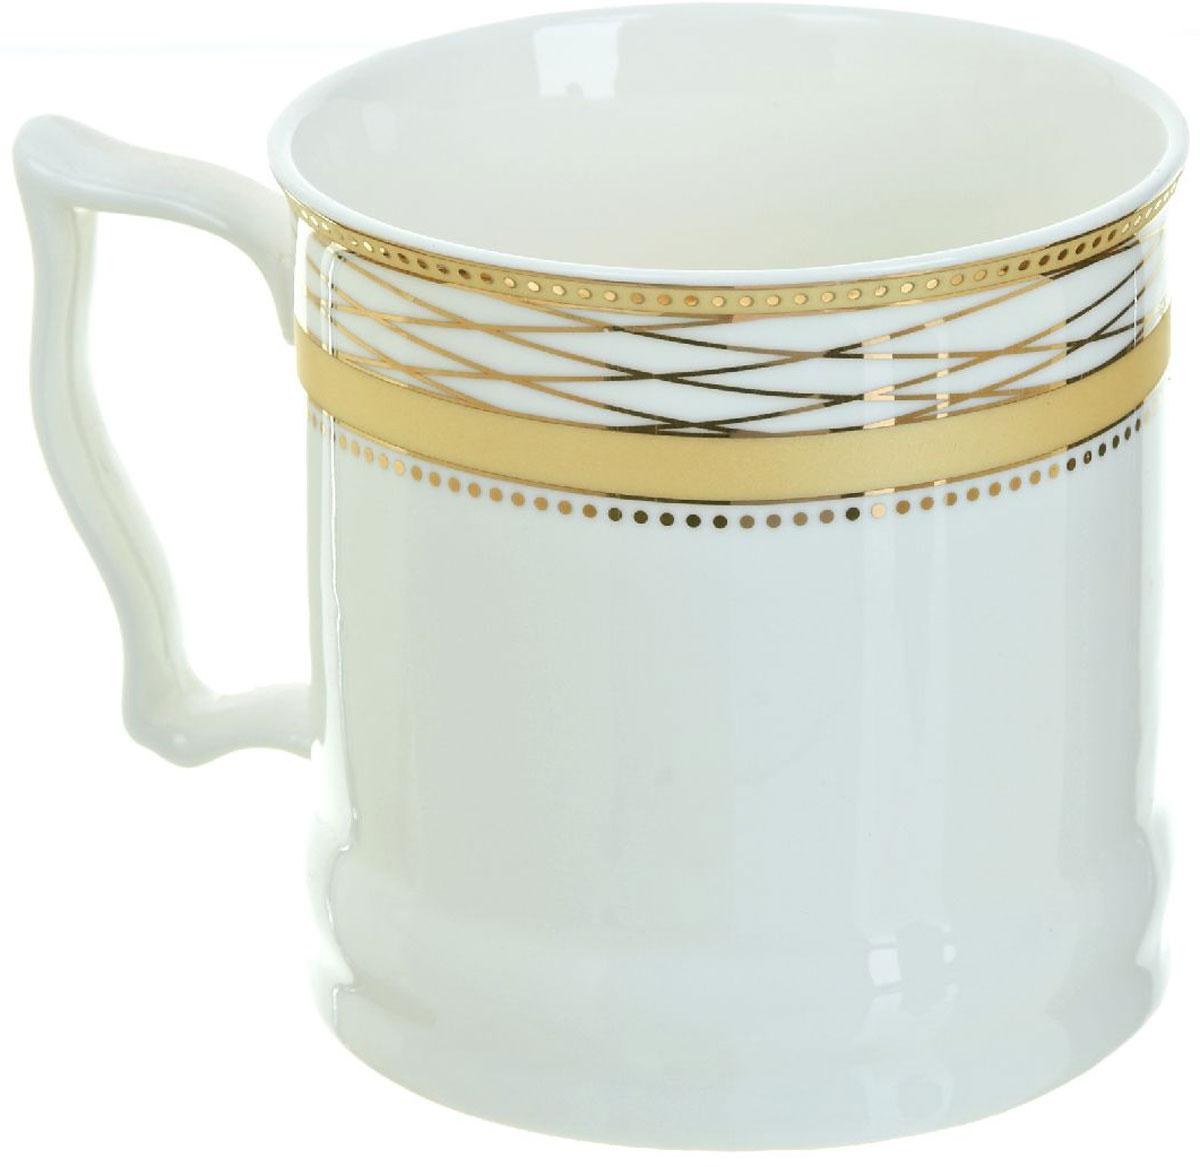 Кружка BHP Королевская кружка, 500 мл. 1870008 кружка amber porcelain сердечки 220 мл